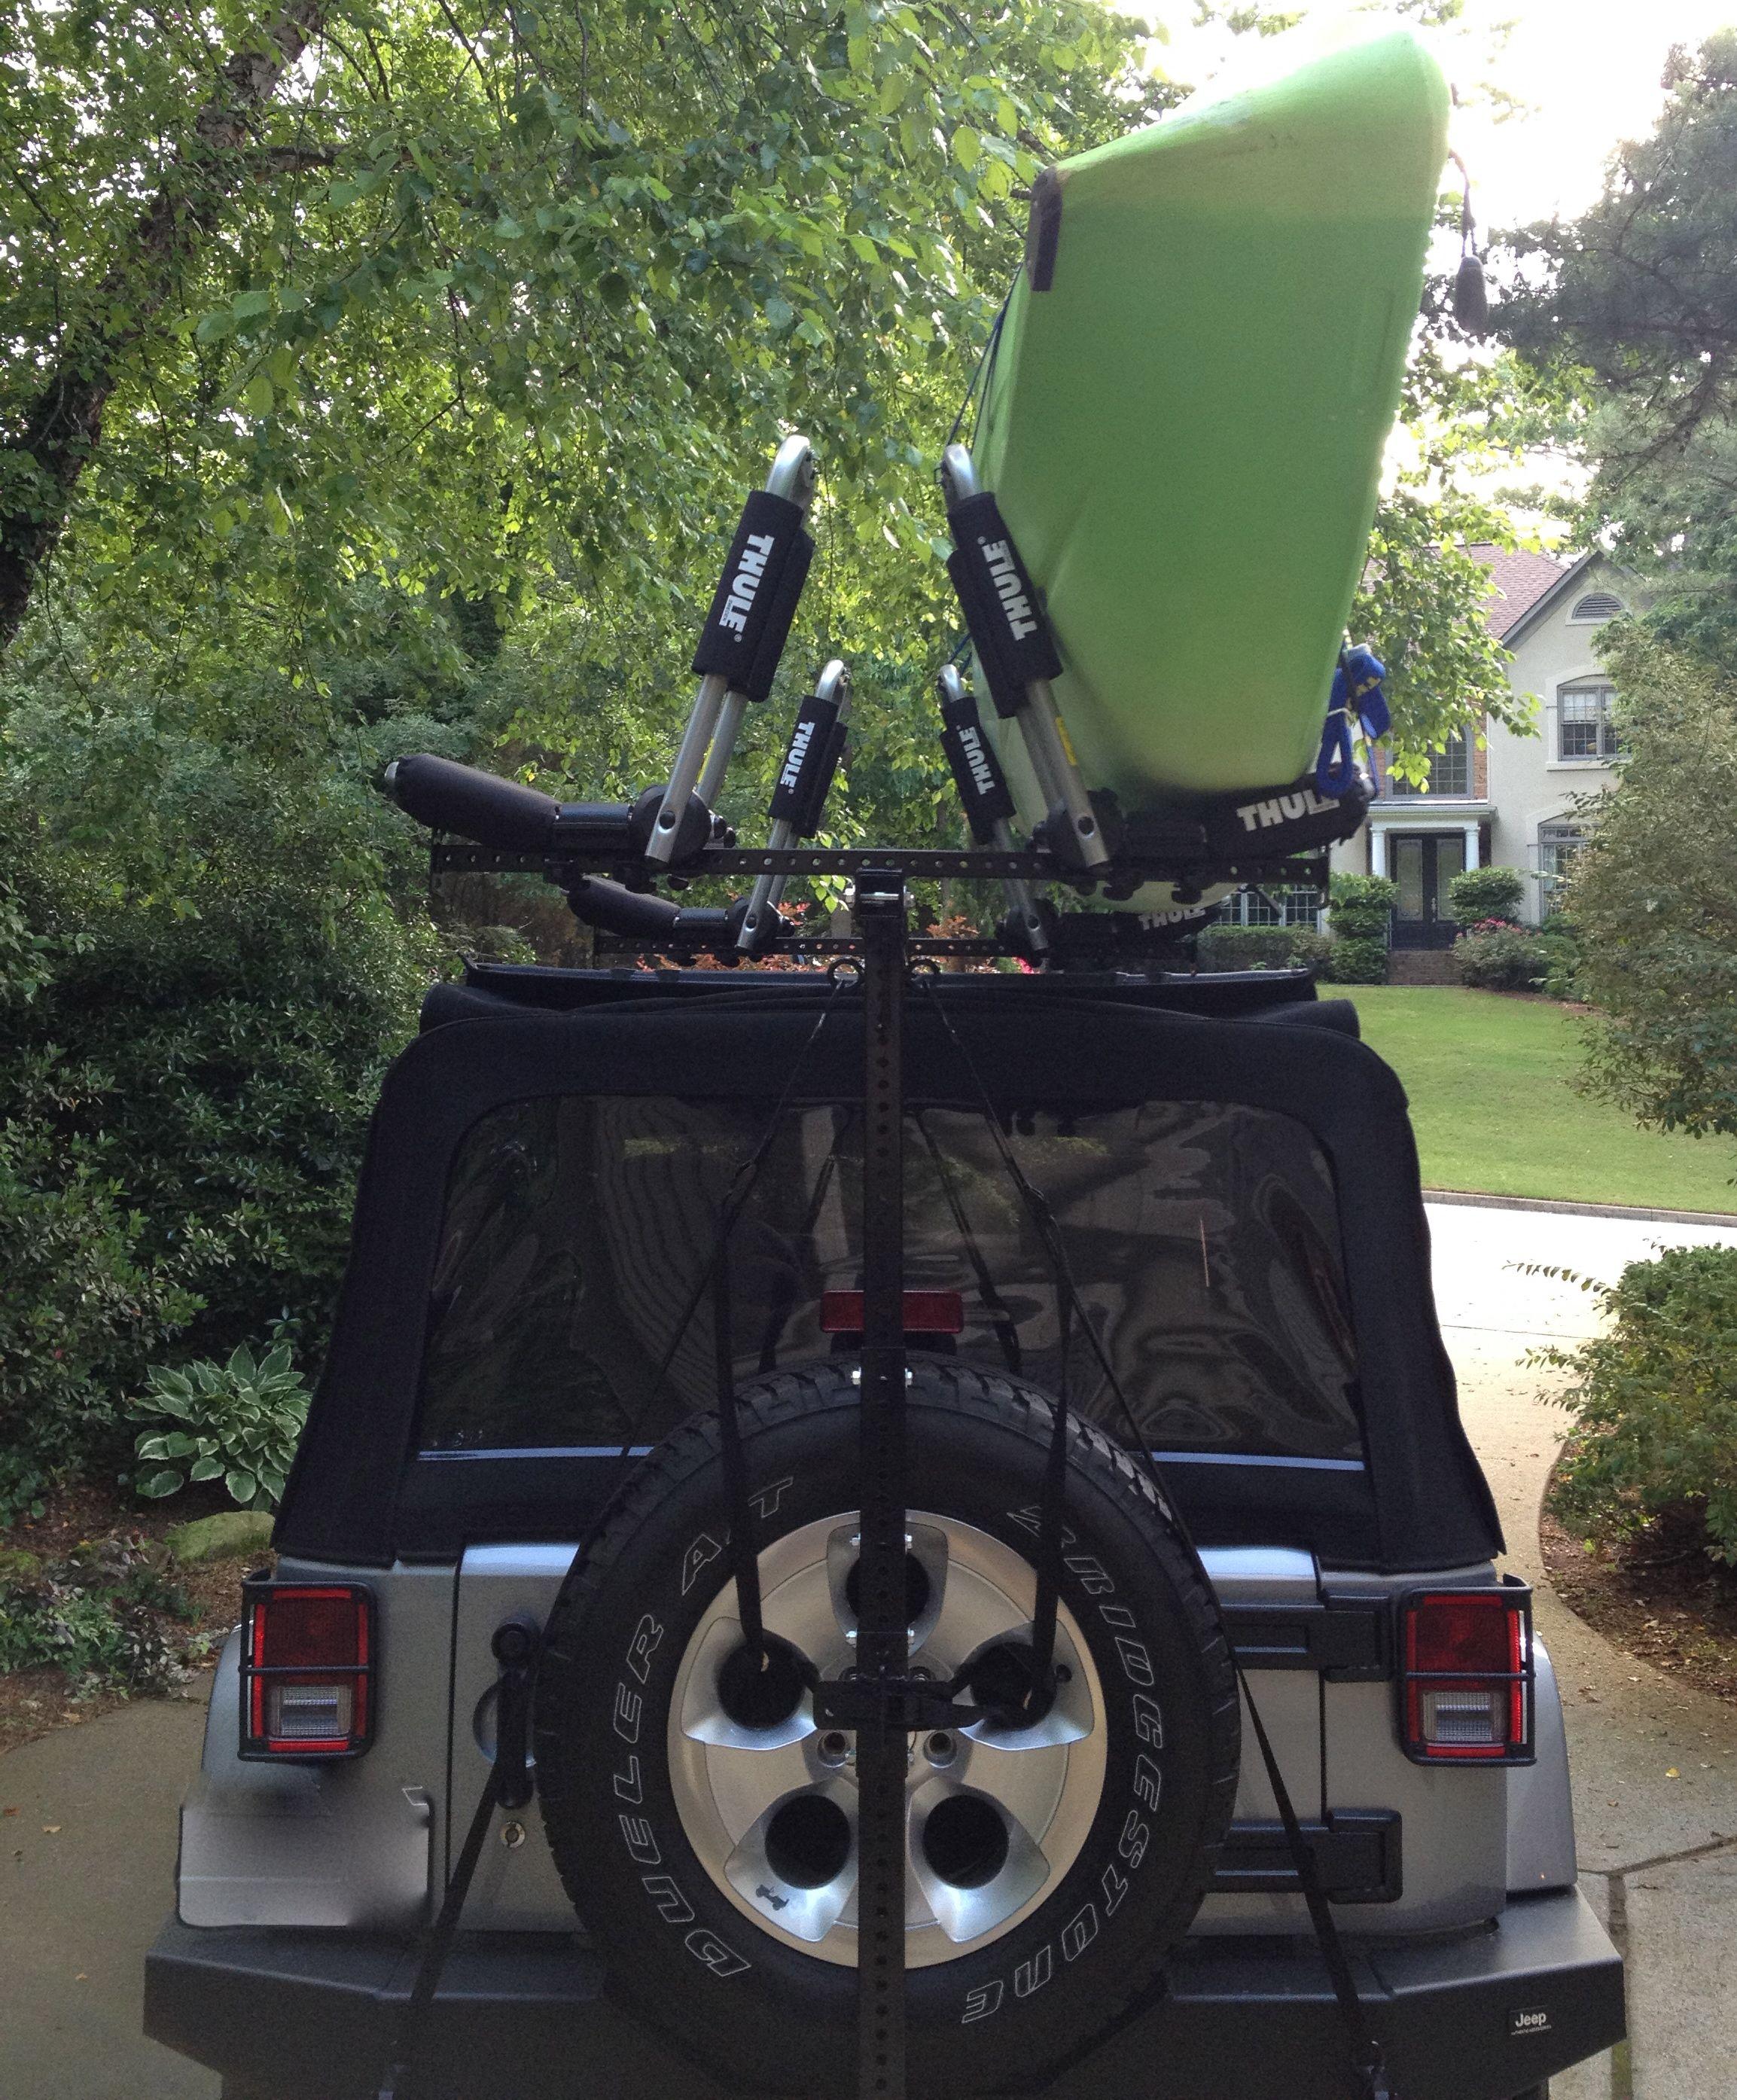 Hitchmount Rack With Thule Mounts Jeep Accessories Kayak Rack Jeep Wrangler Kayak Rack